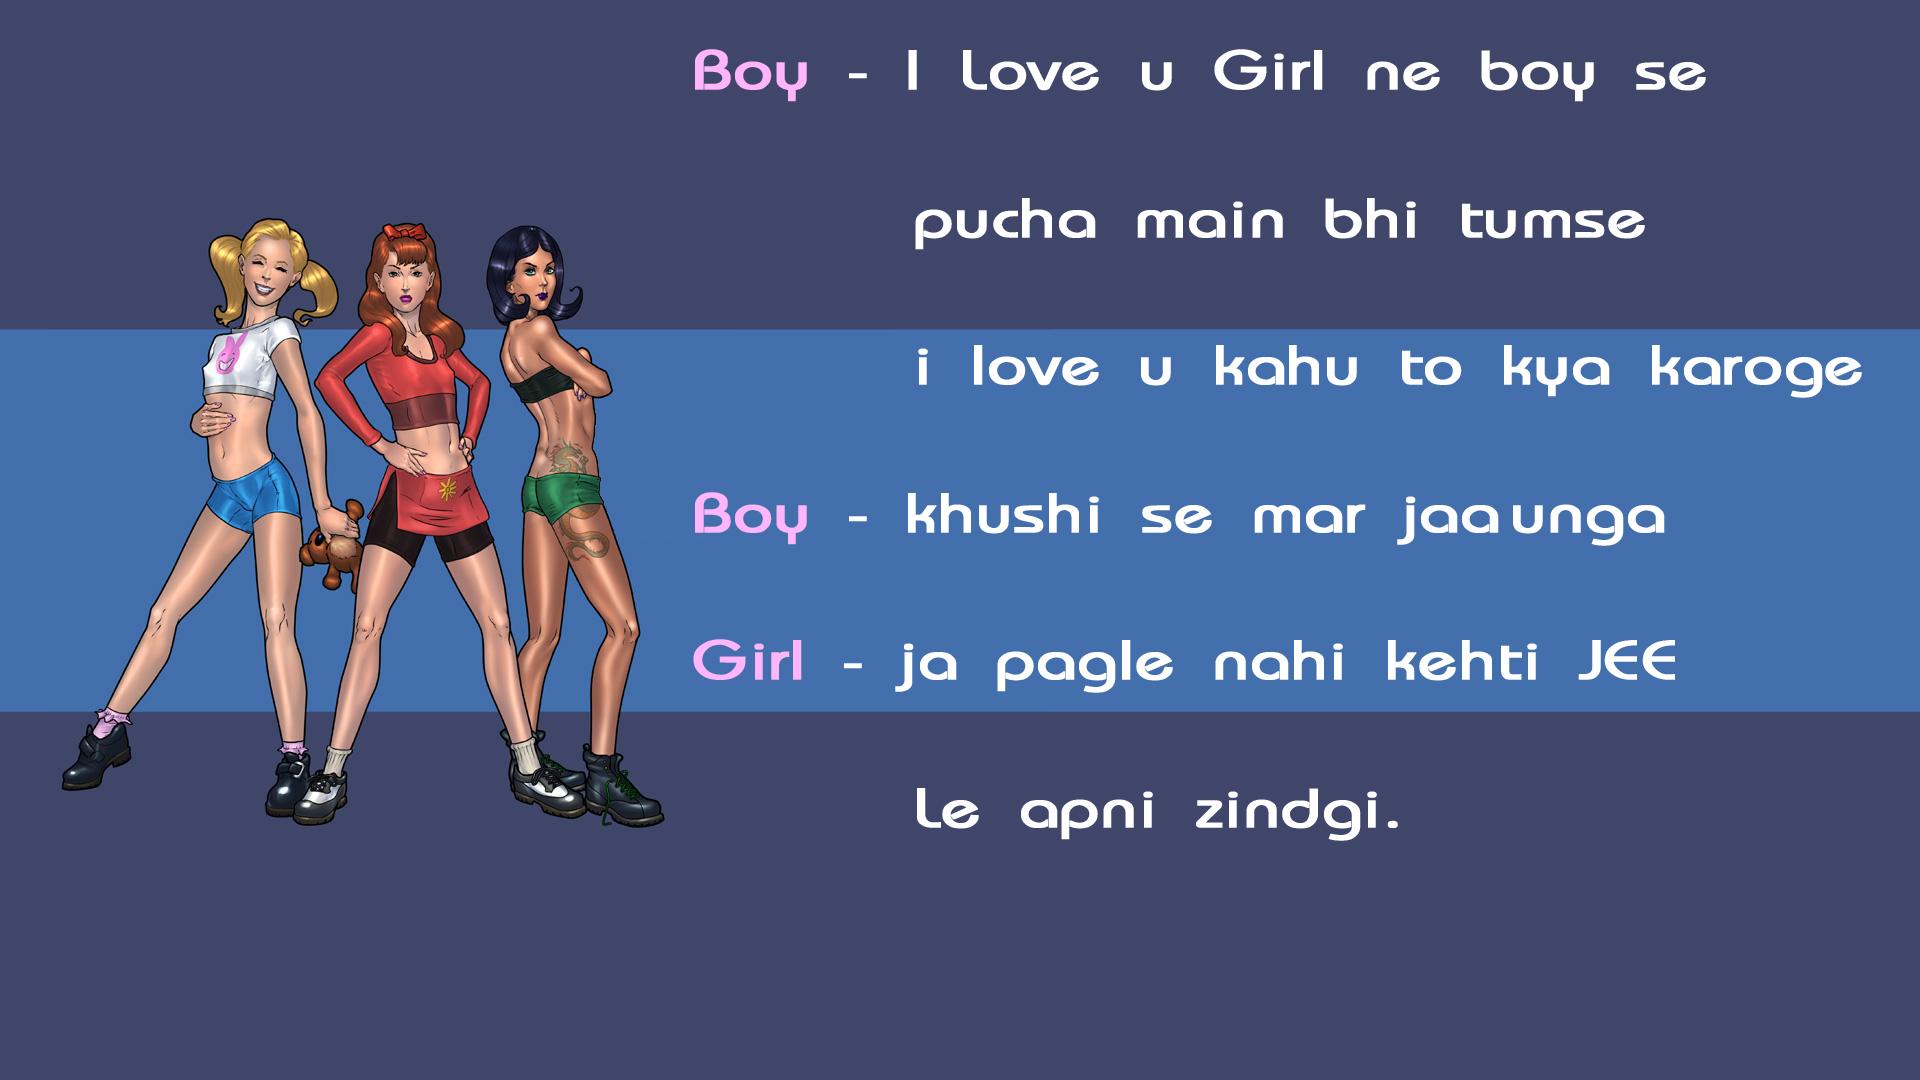 boy girl hindi funny jokes wallpaper 1920x1080